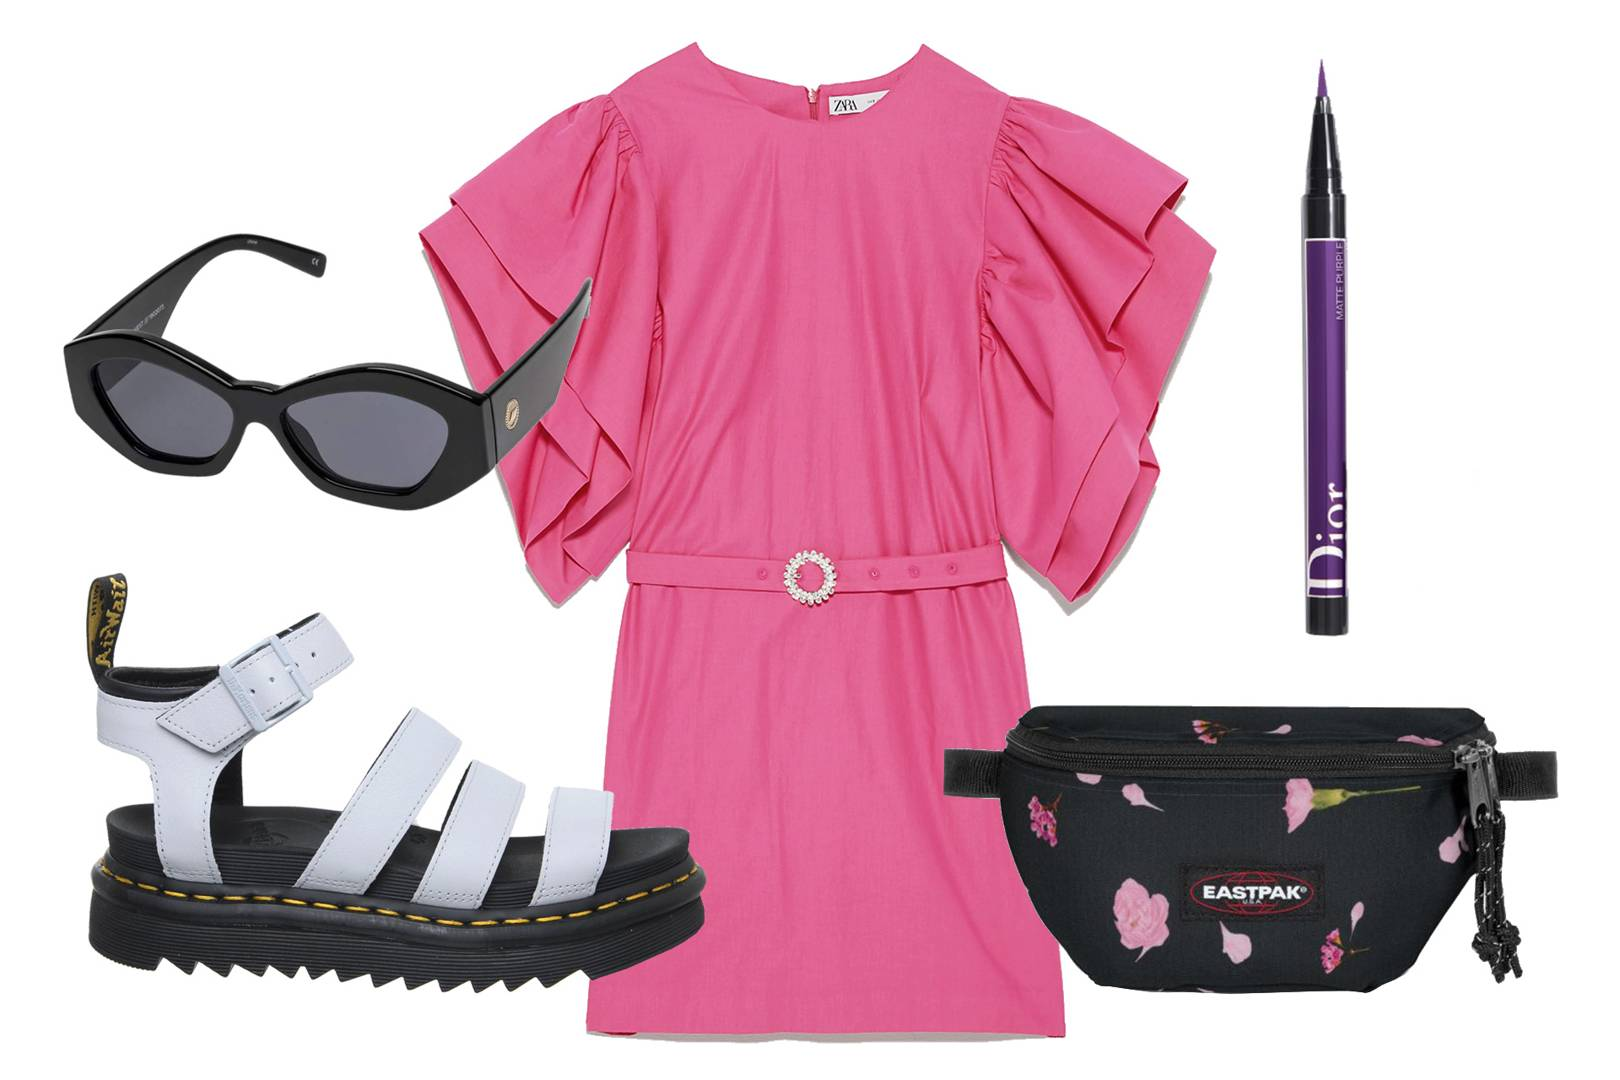 cb9177551d8c Summer Dresses Styled Different Ways | British Vogue